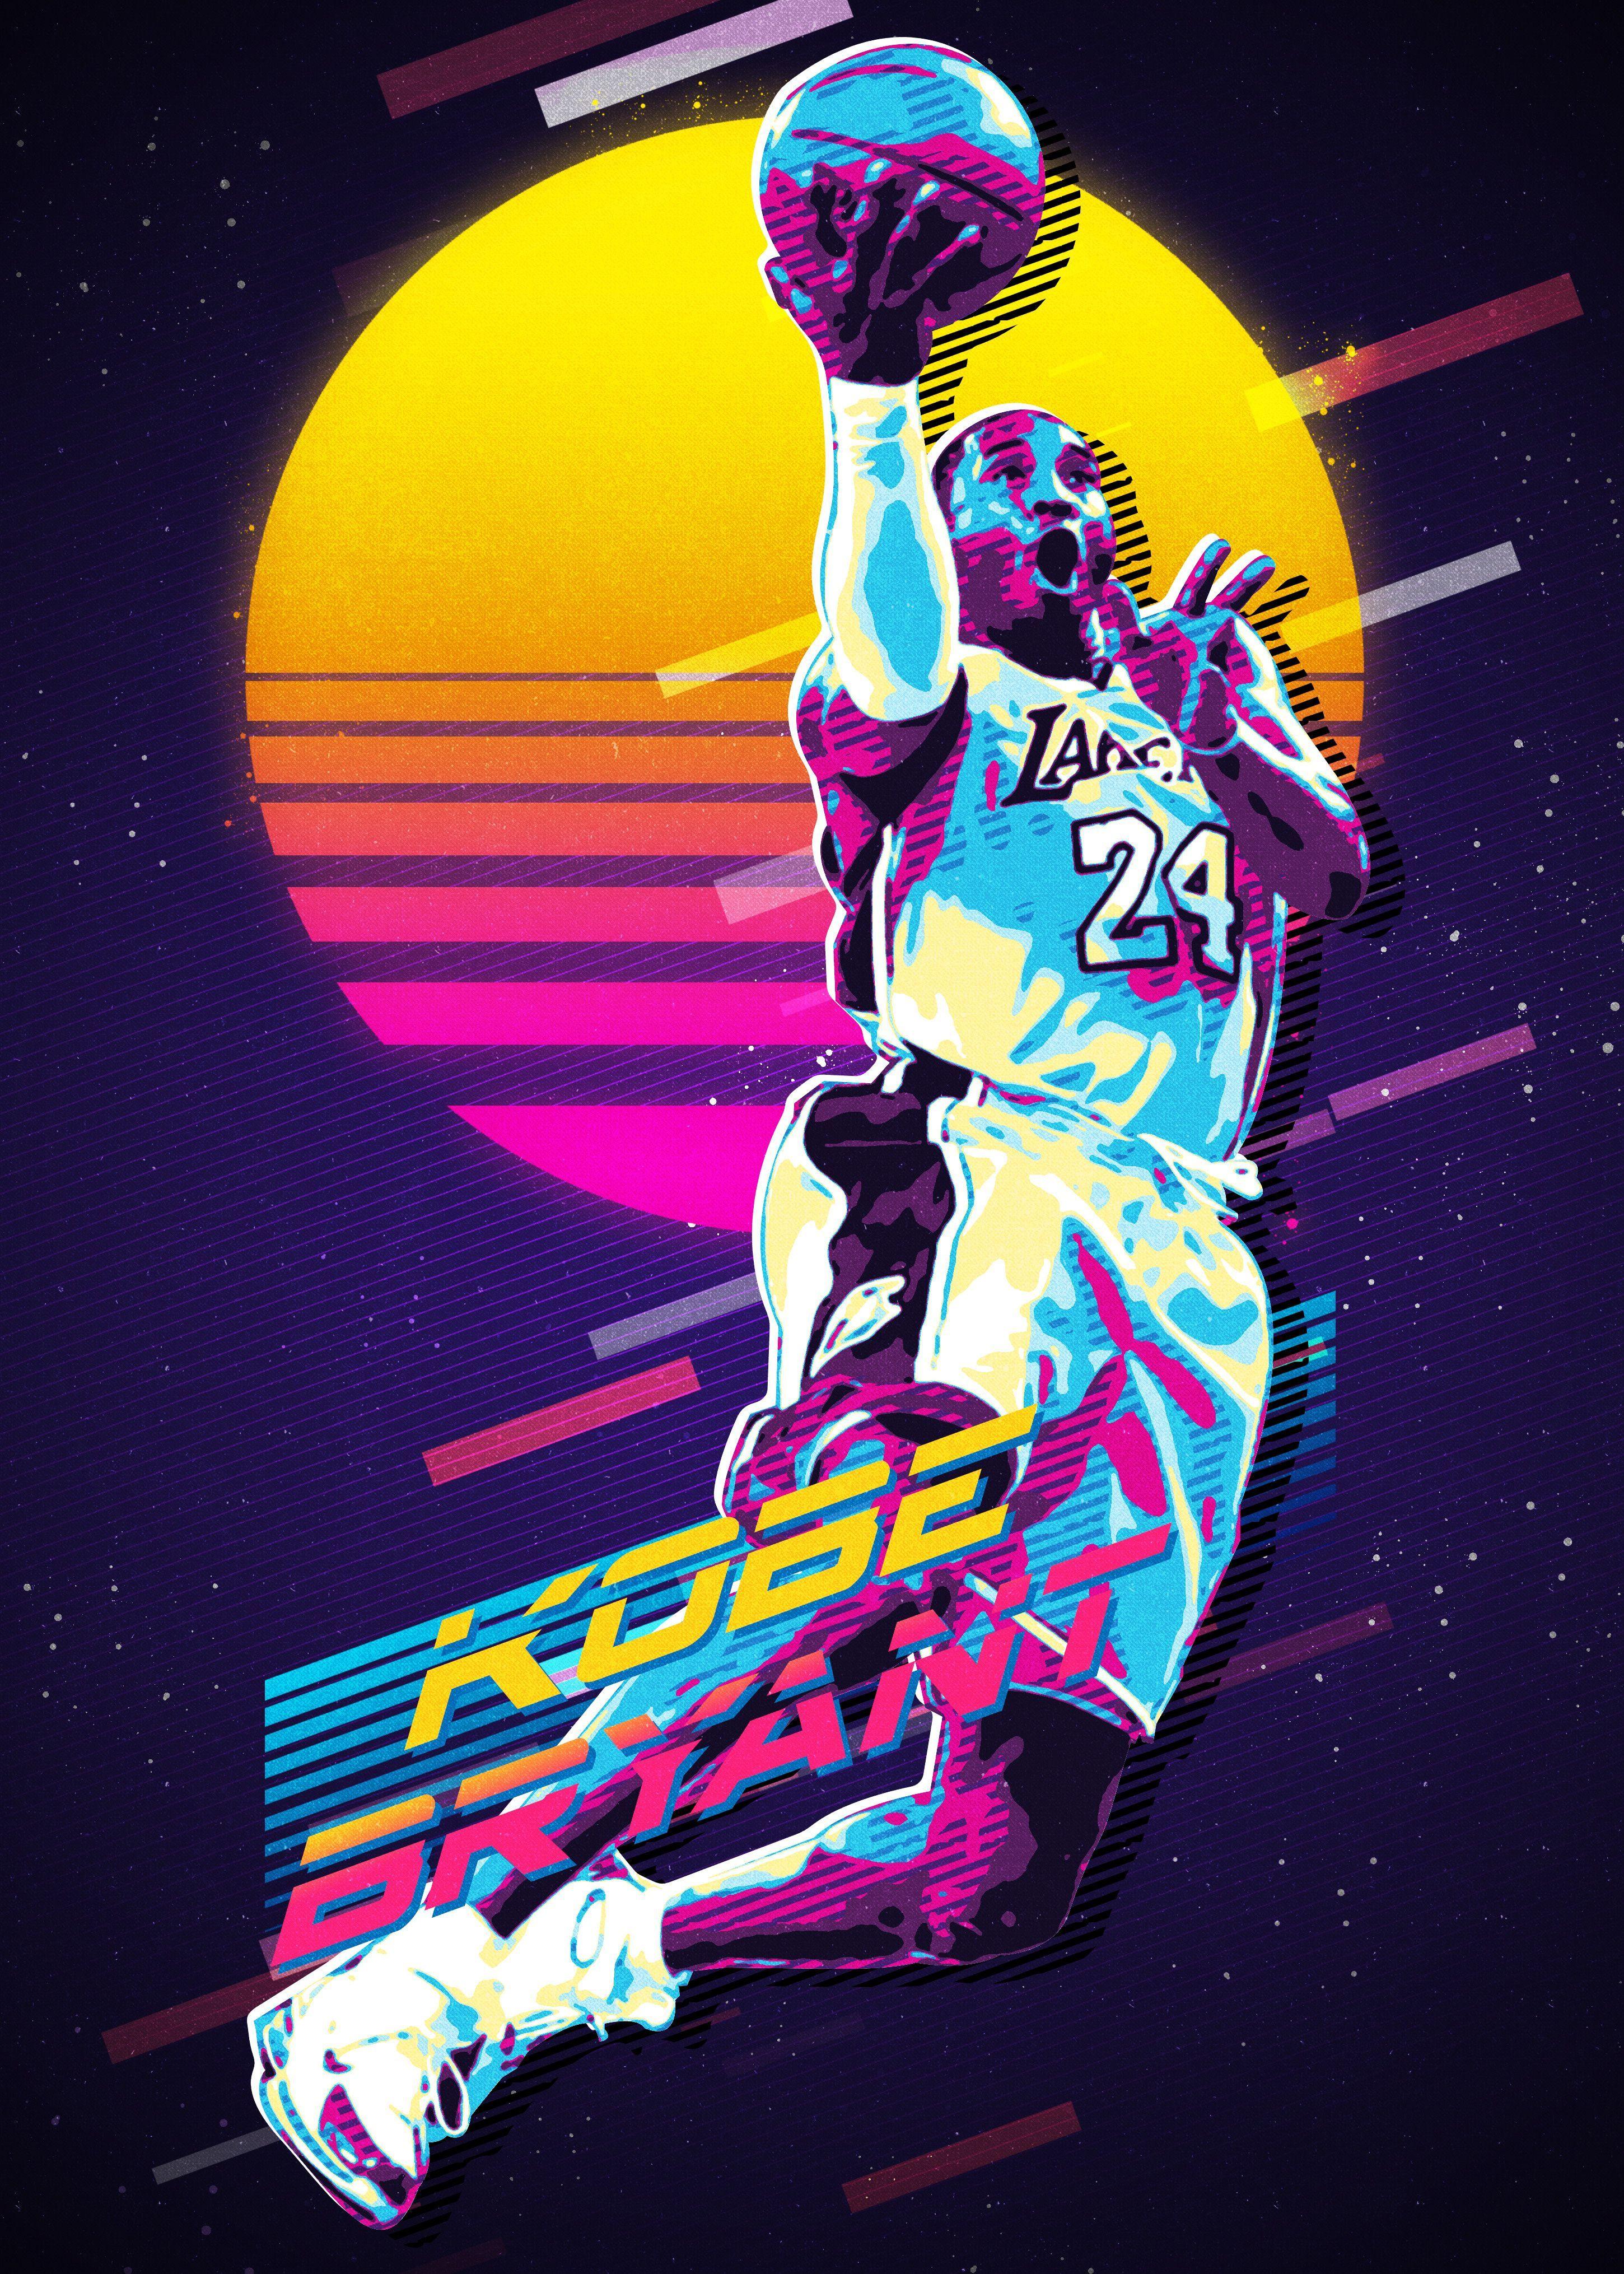 Kobe Bryant T Shirts Kobe Bryant Wallpaper Lakers Kobe Kobe Bryant Poster